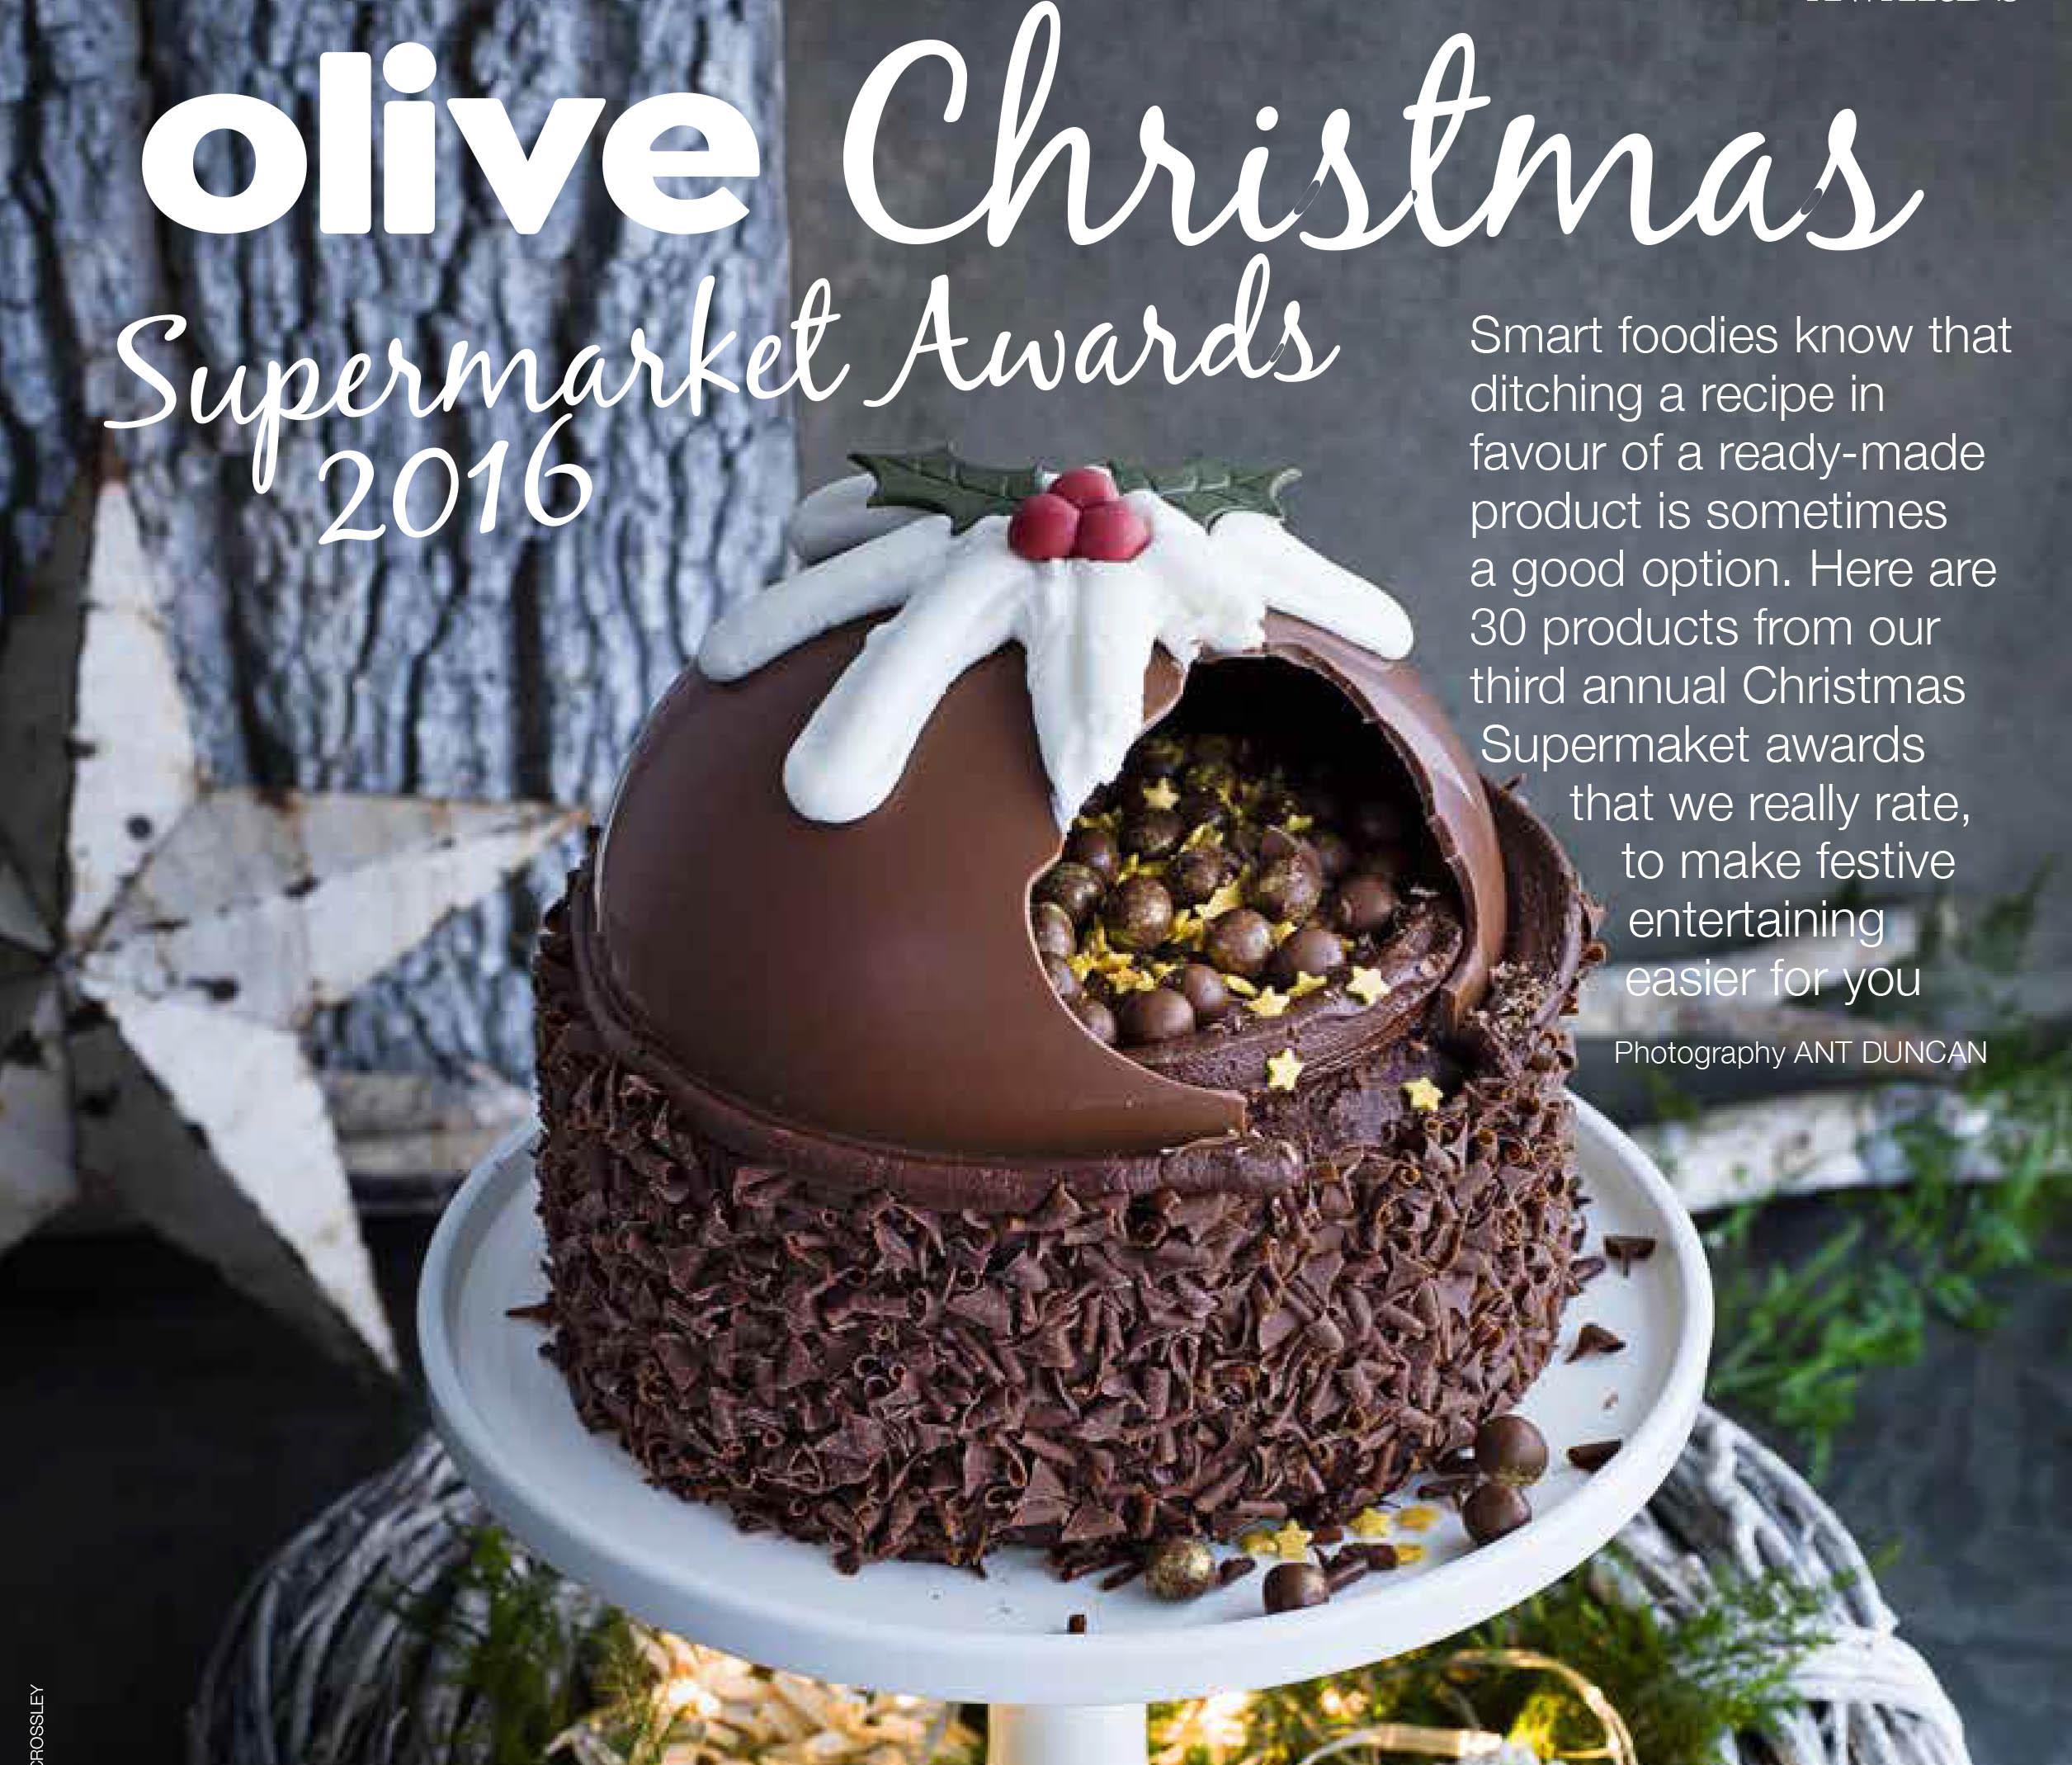 Inside olive magazine, Ch